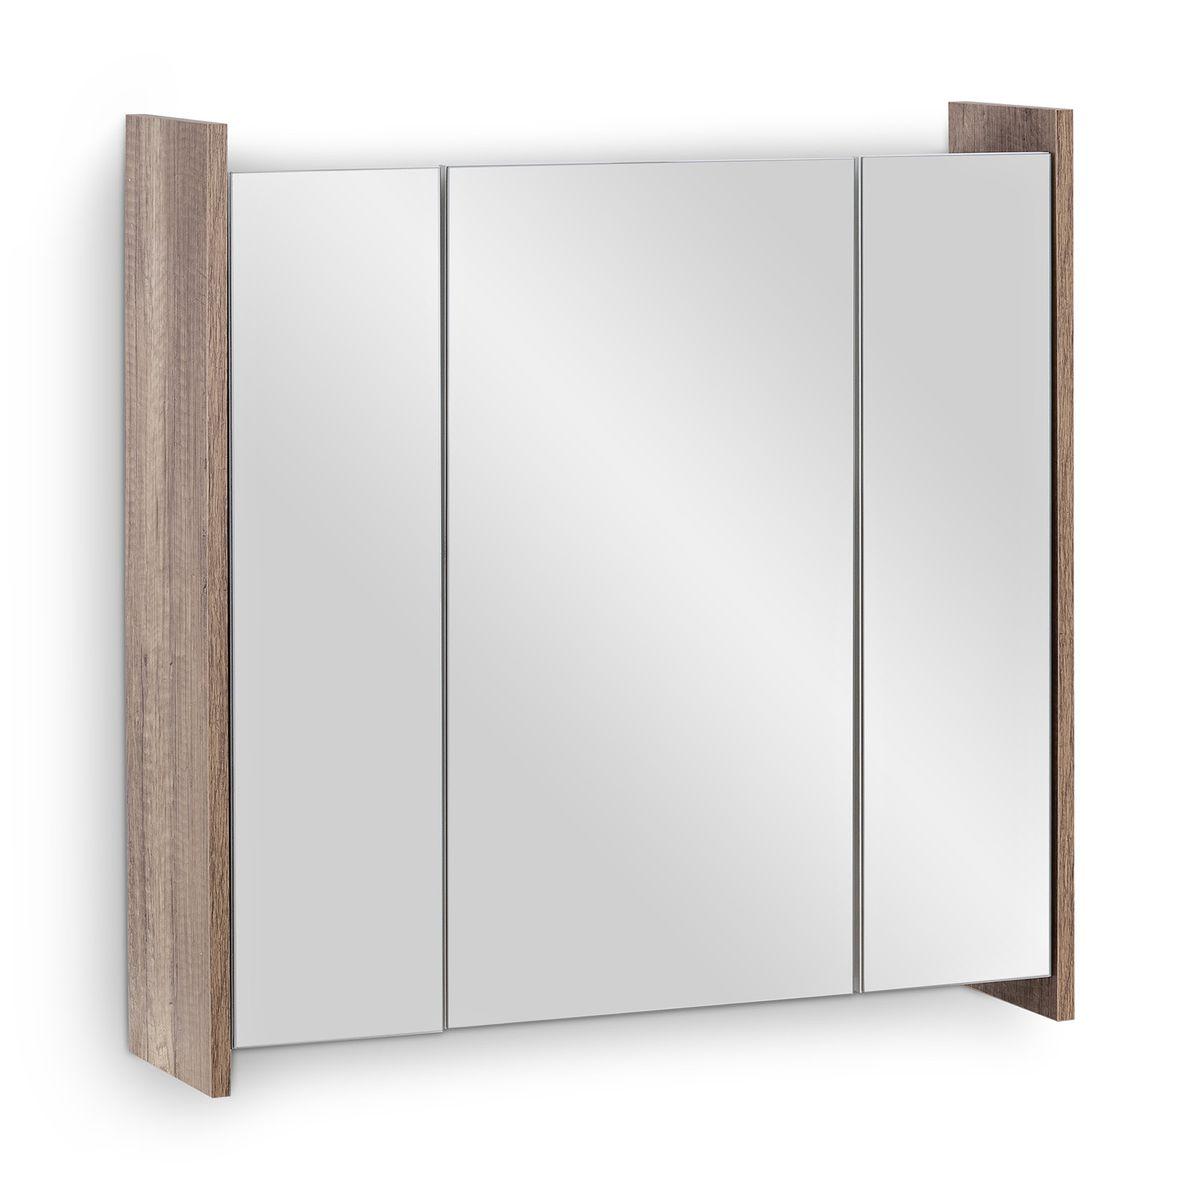 Badmöbel-Set FROSTI 2-teilig Monumental OAK Weiß – Bild 2